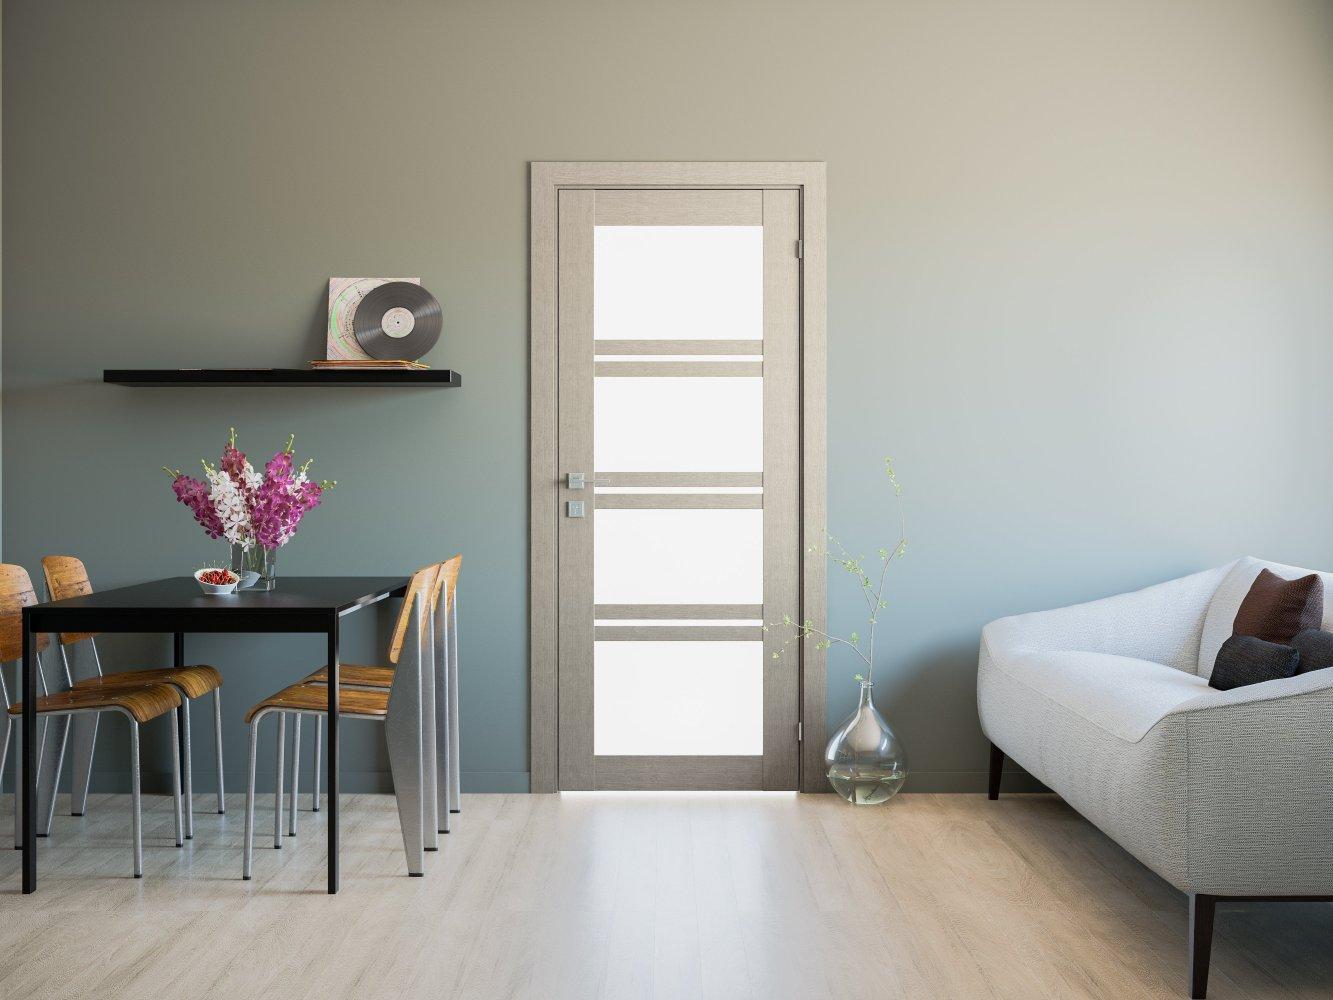 Двери Modern Quadro Родос крем со стеклом - Межкомнатные двери — фото №2